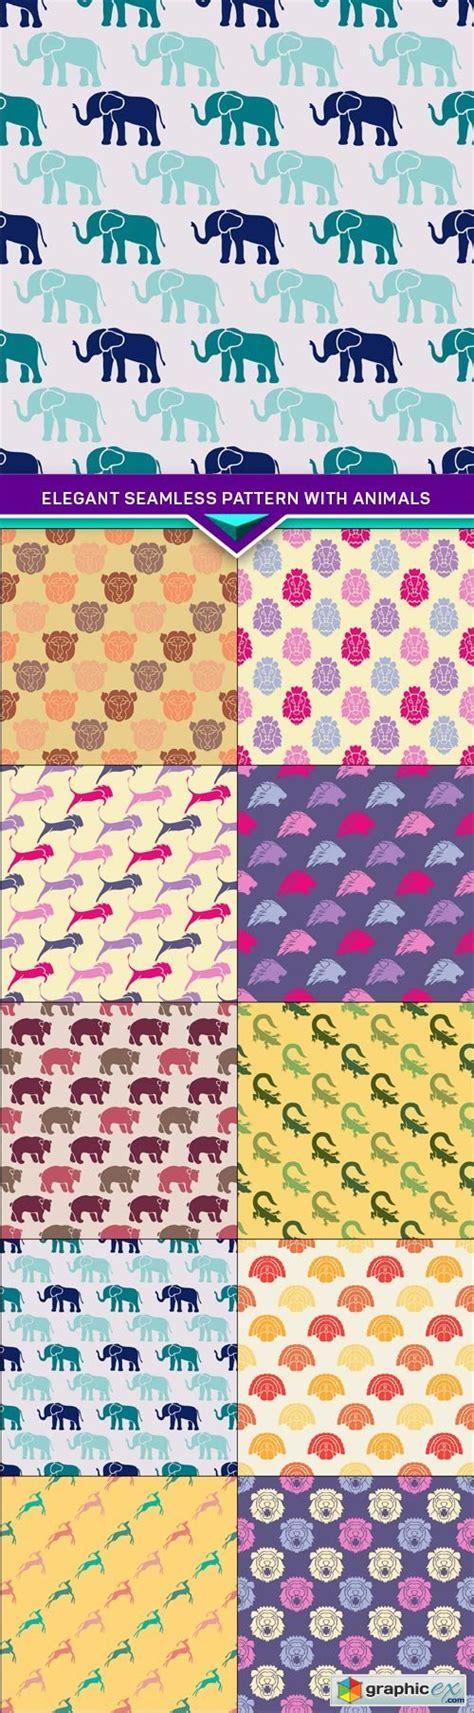 seamless pattern app elegant seamless pattern with animals 10x jpeg stock